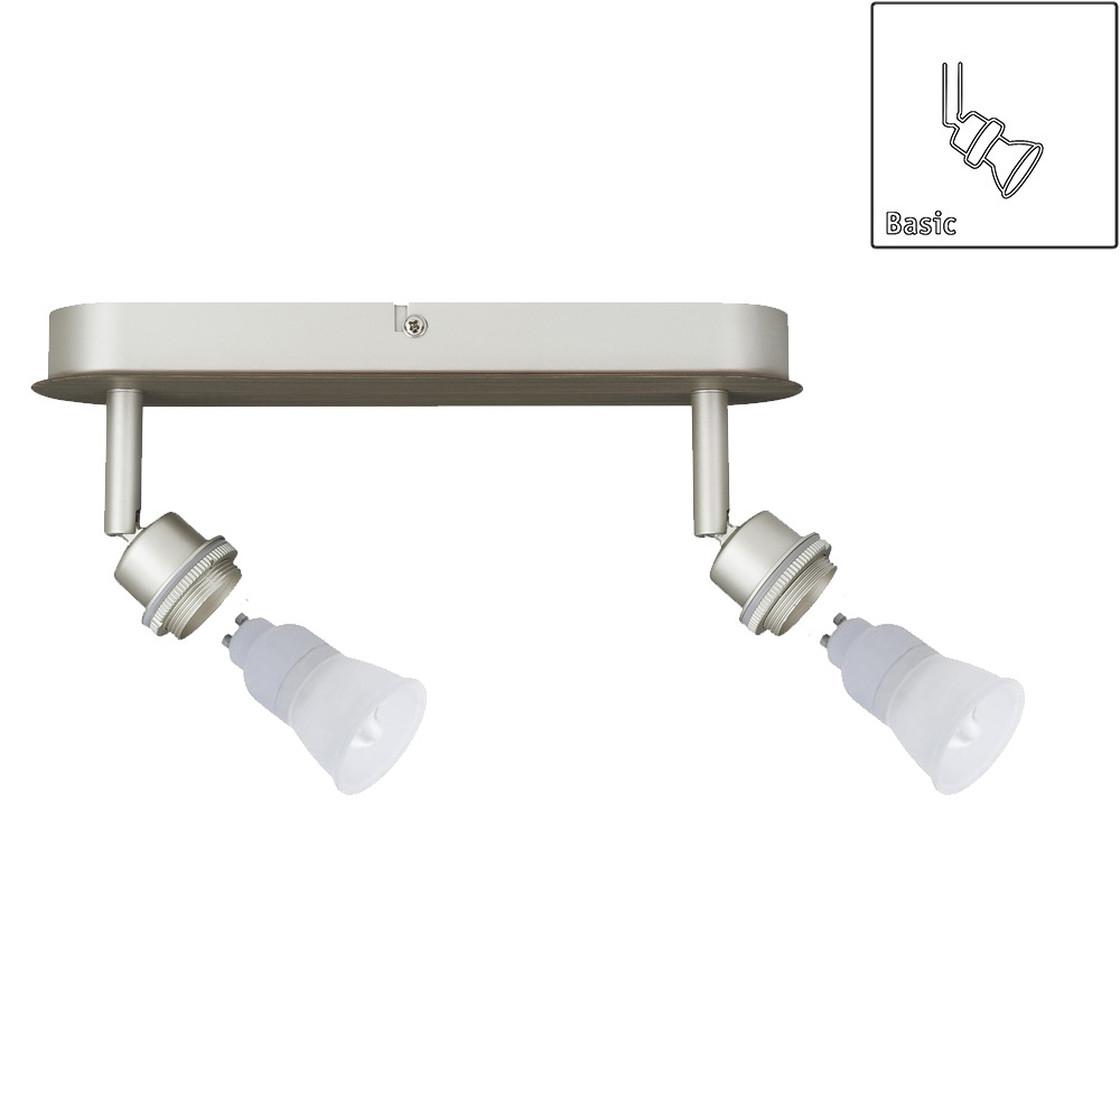 Paulmann decosystems basic spotlight 2x7w gz10 nic for Lampen rampe